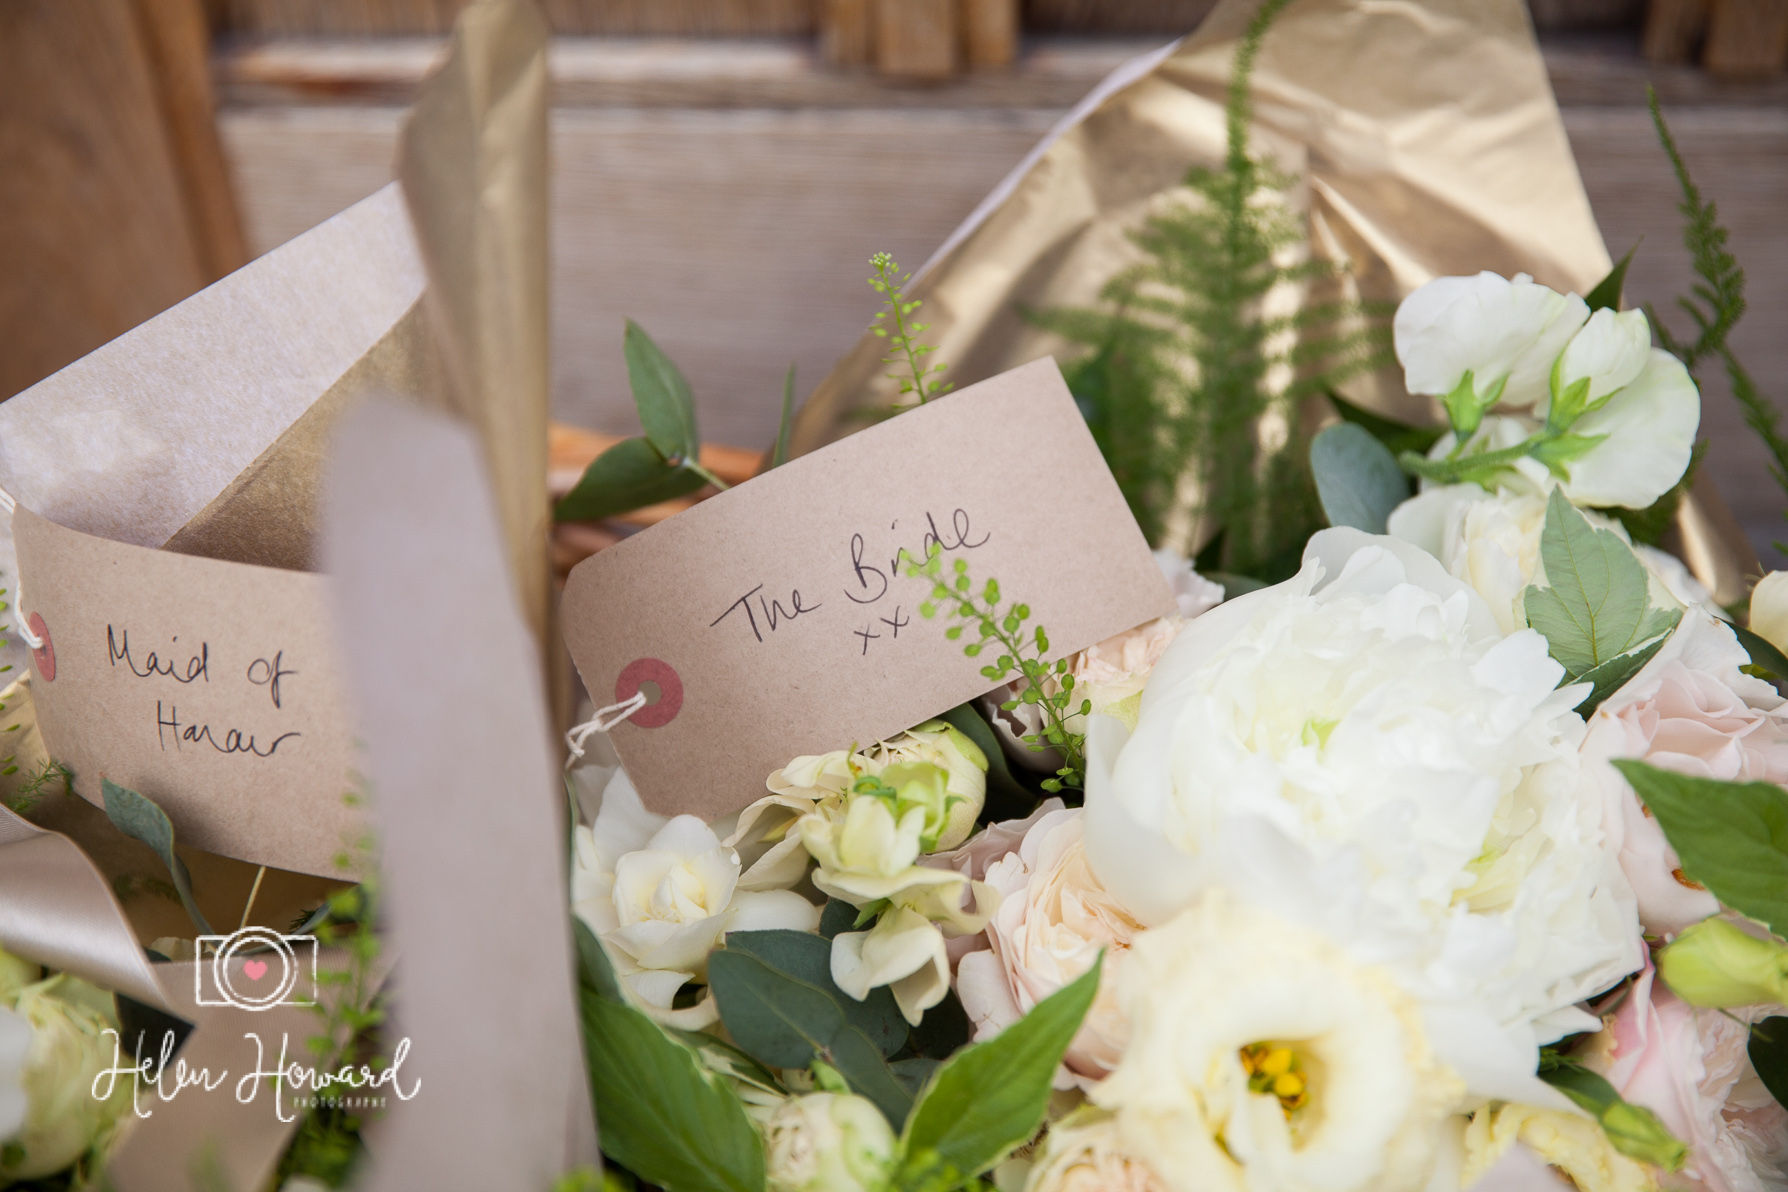 Helen Howard Photography Packington Moor Wedding-33.jpg